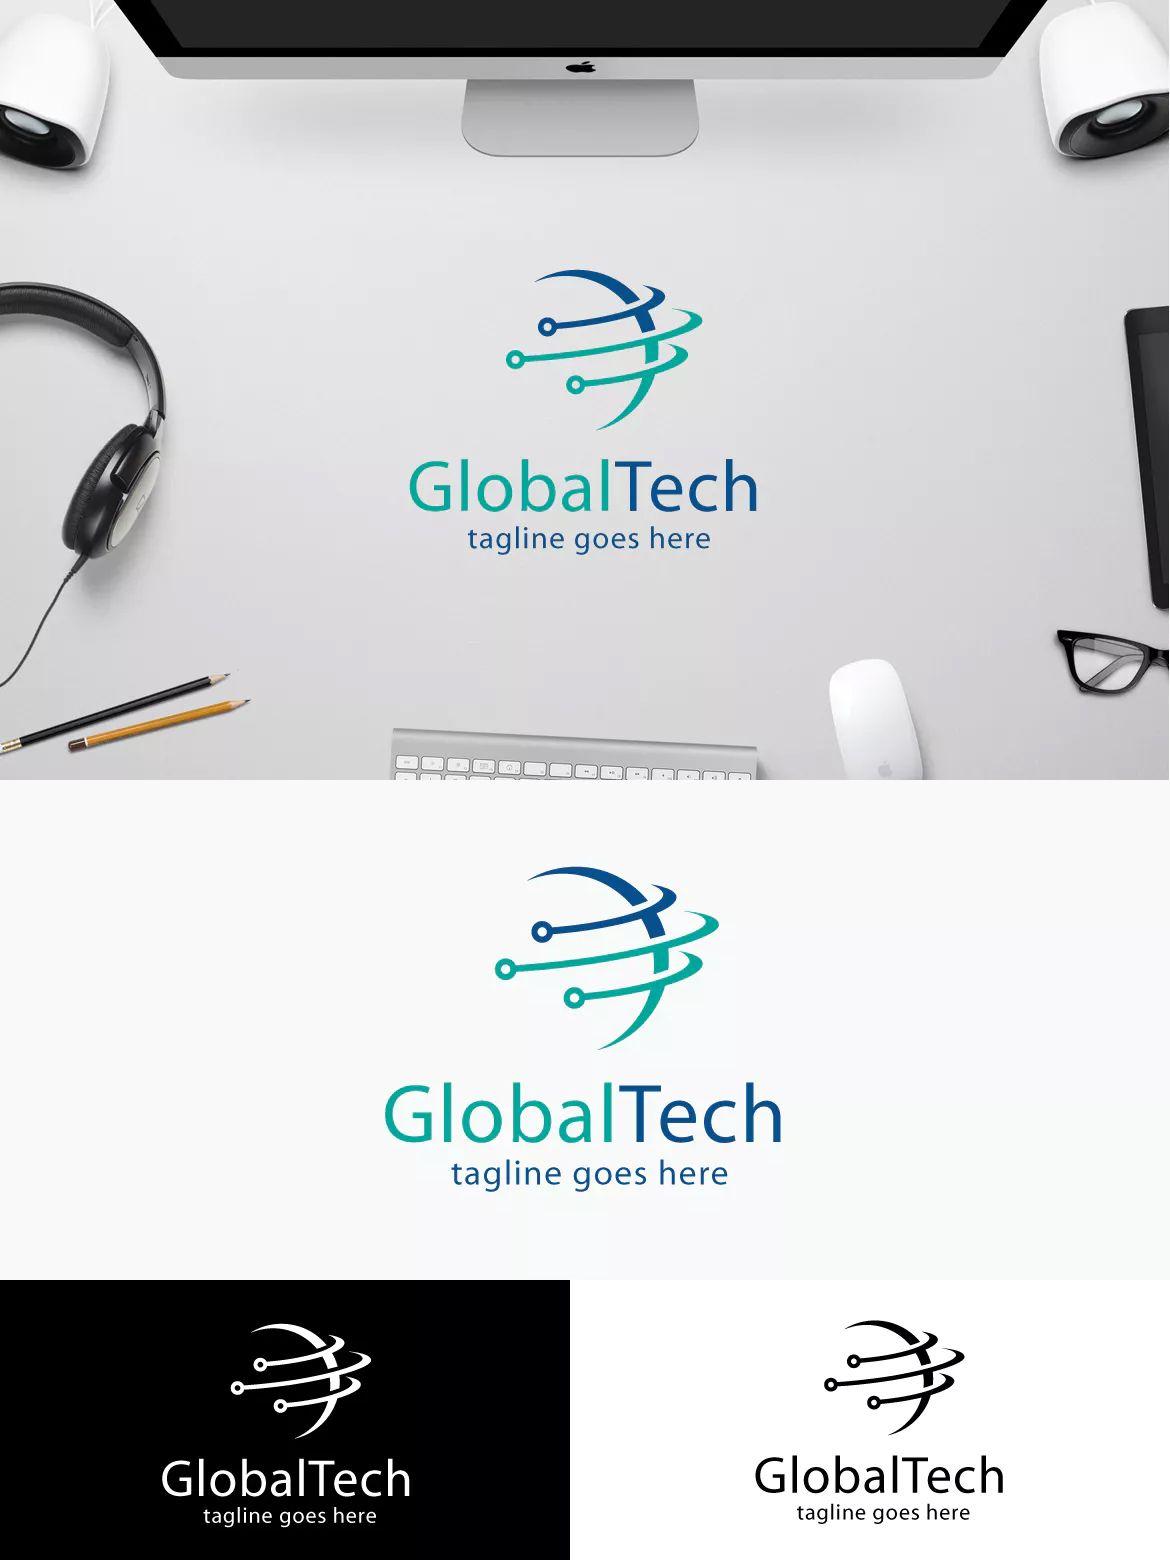 Global Tech by yip87 on Envato Elements | Global logo, Tech